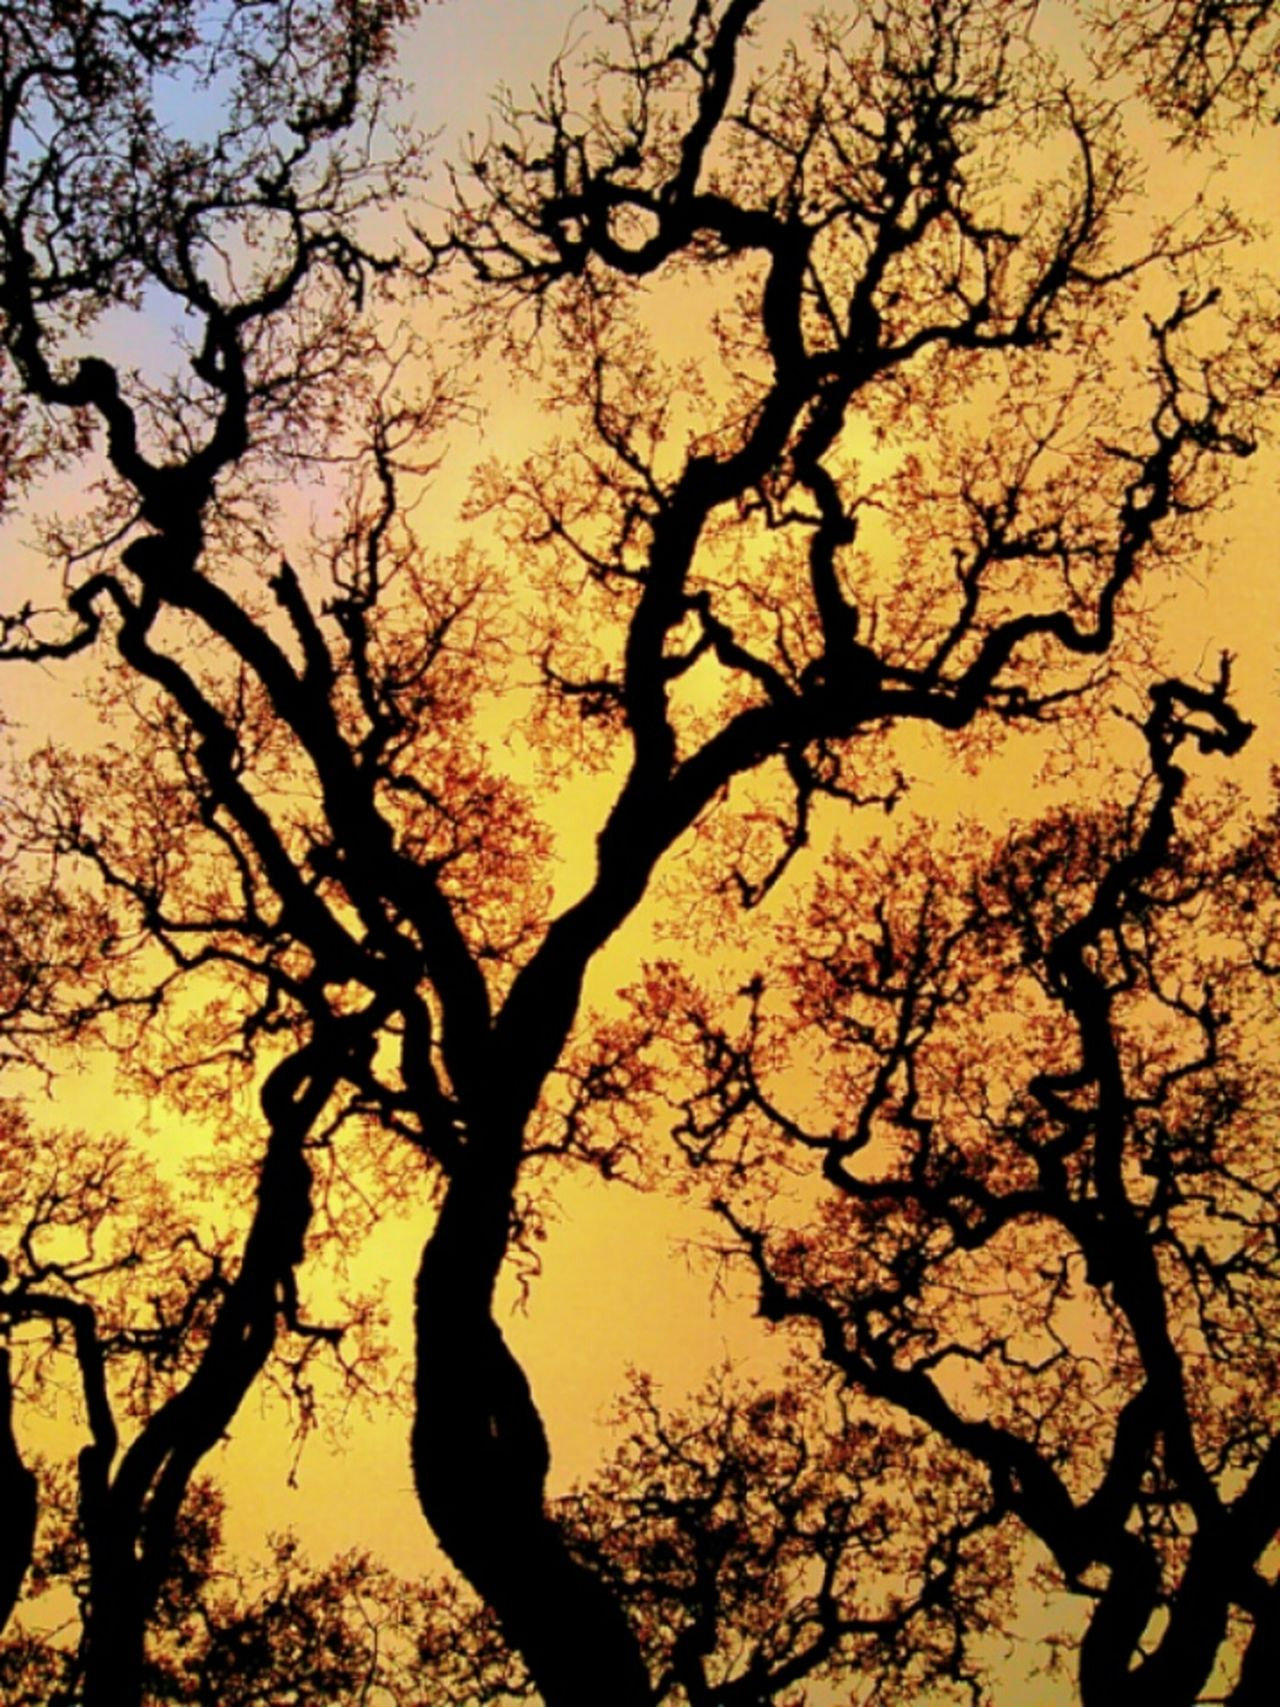 Pivotal Ideas Tree Hillsborough, Ca Perspectives On Nature